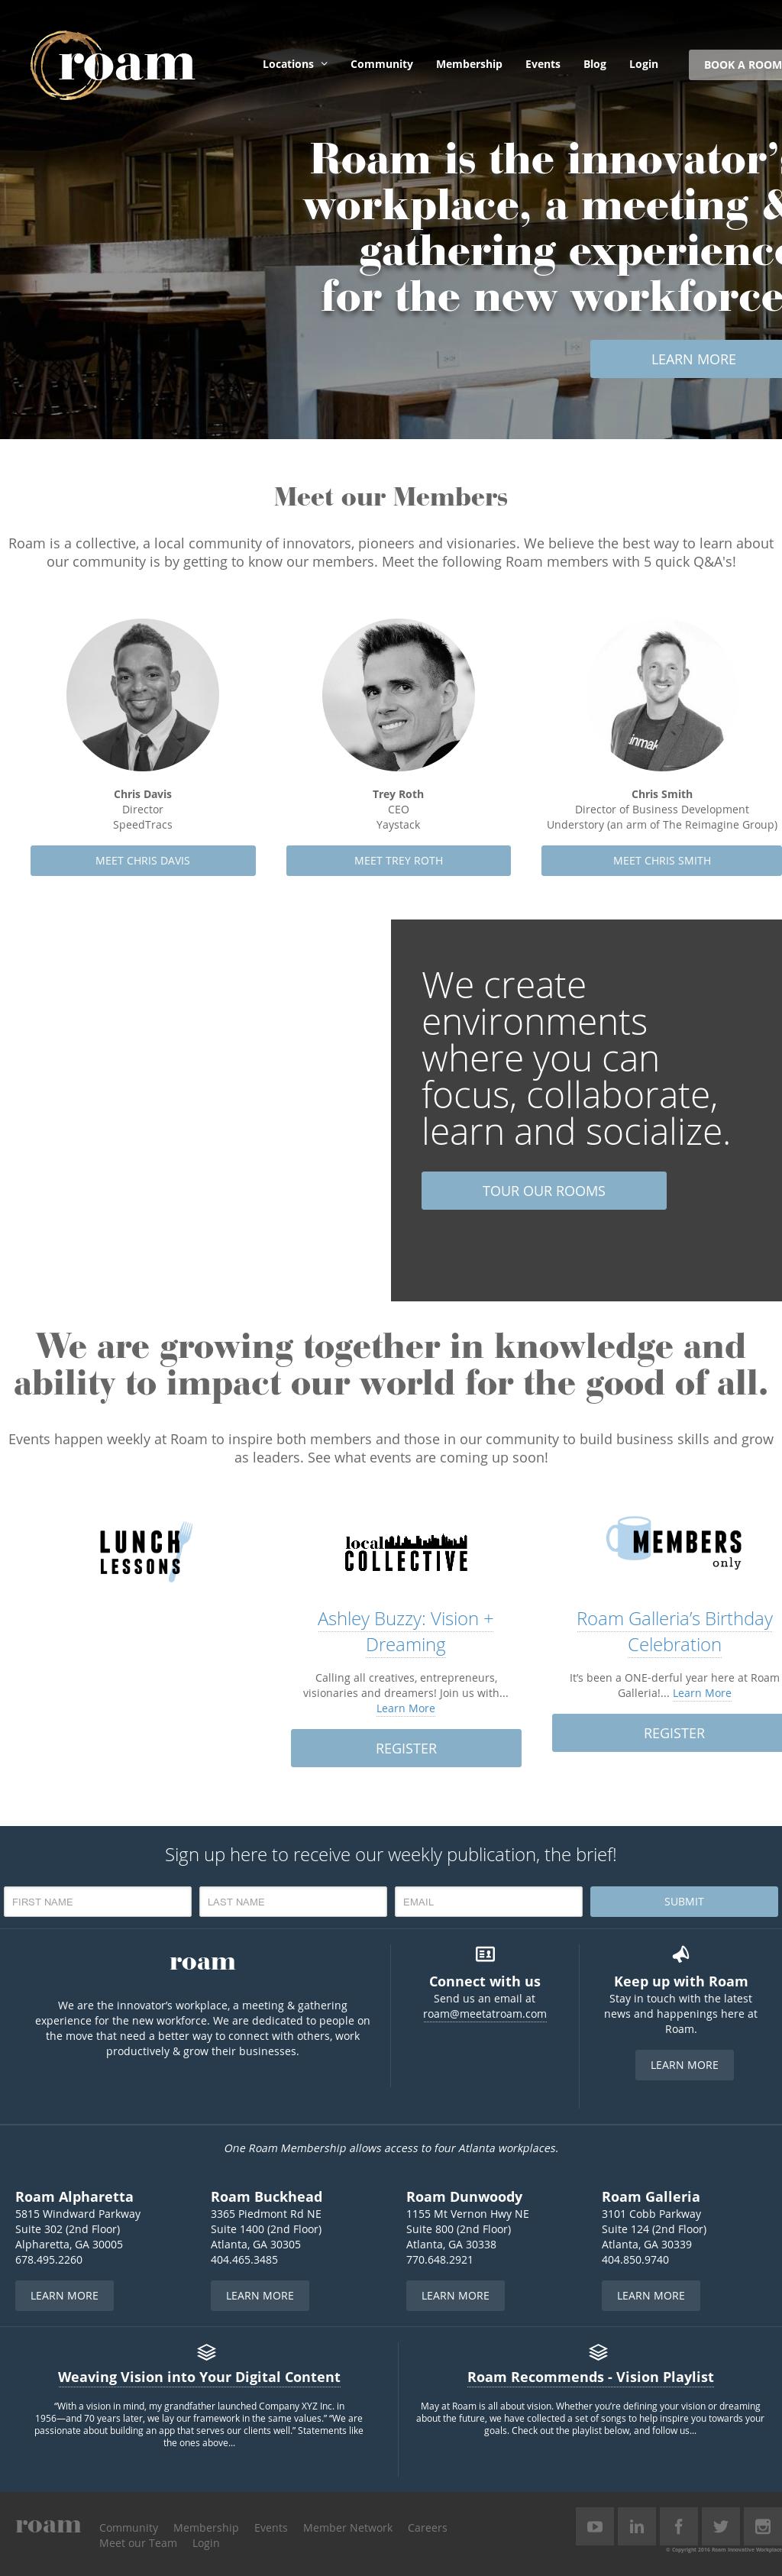 Meetatroam Competitors, Revenue and Employees - Owler Company Profile